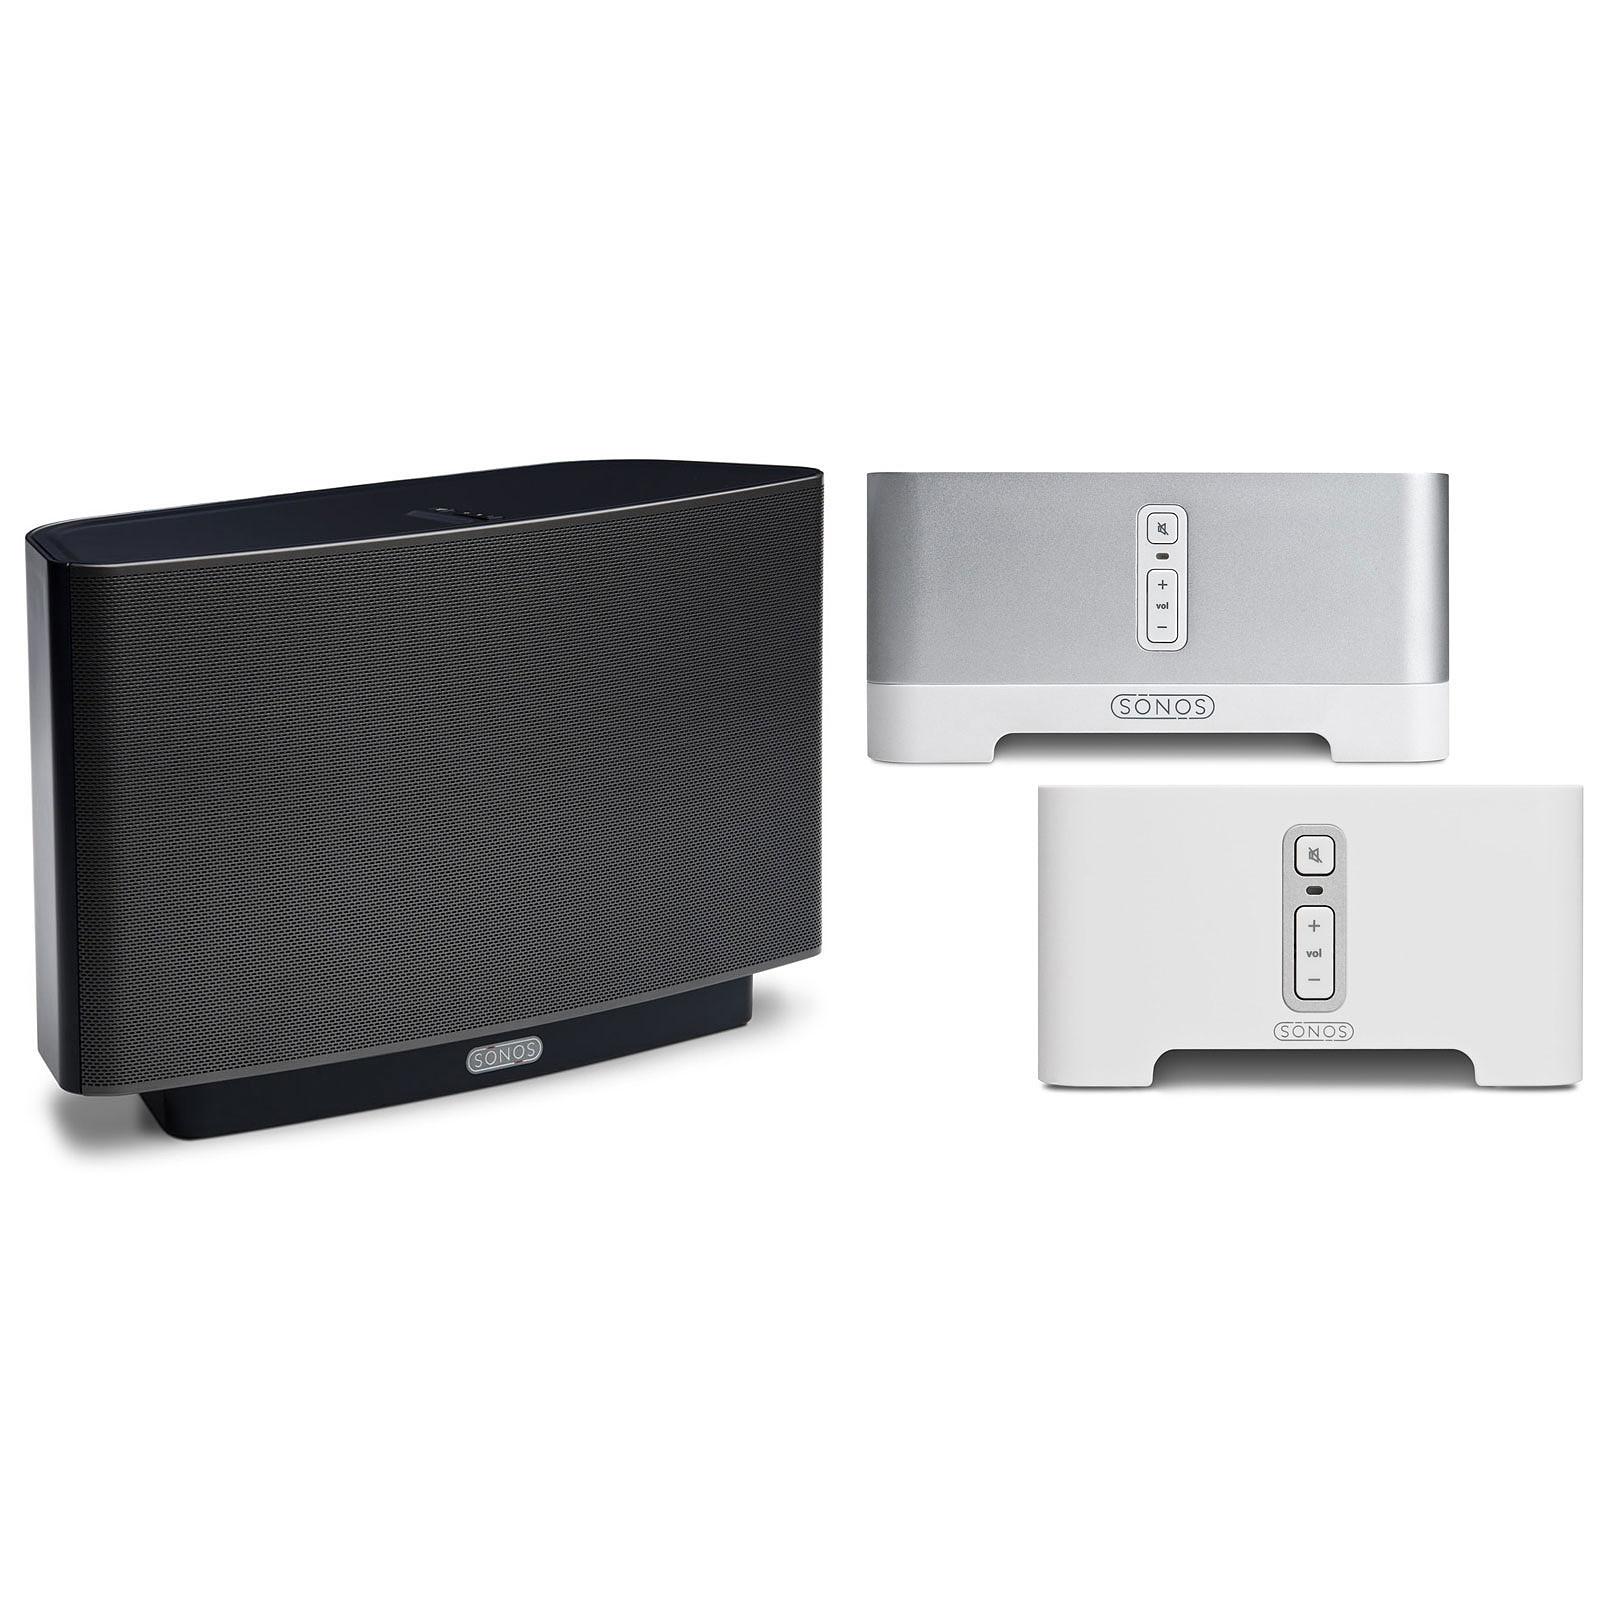 Sonos CONNECT AMP + CONNECT + PLAY 5 NOIR